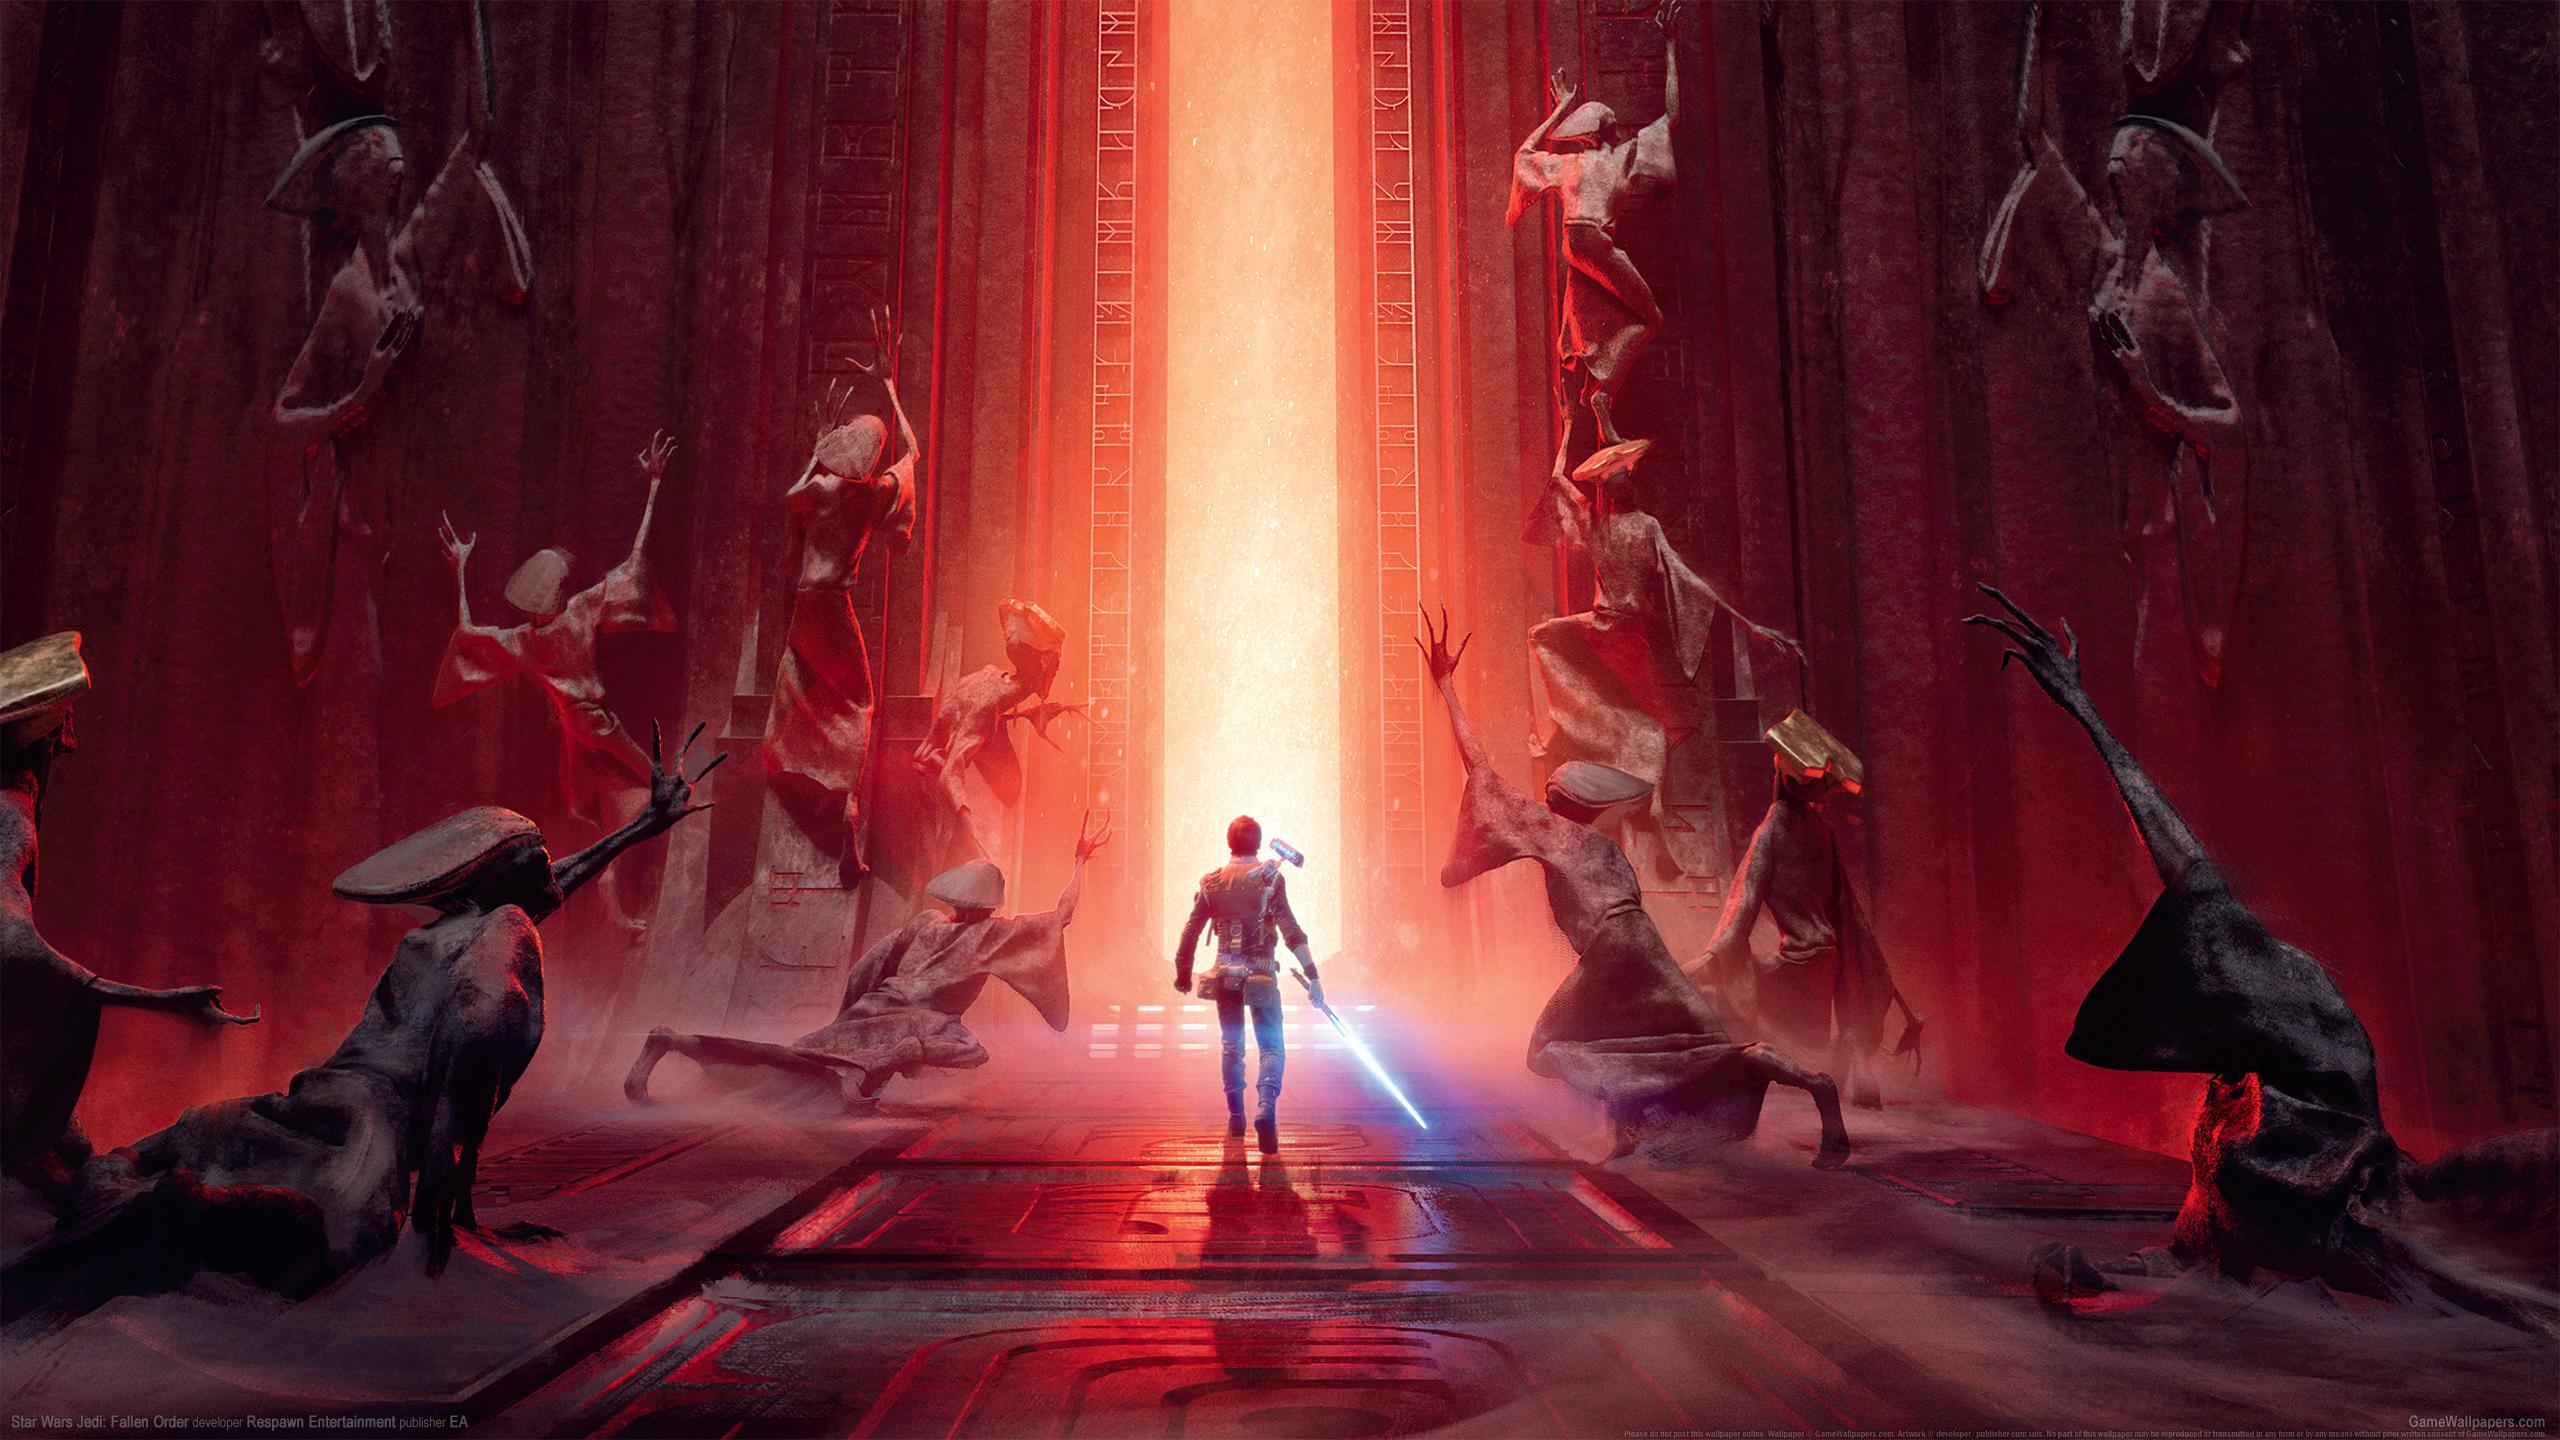 Star Wars Jedi Fallen Order Wallpaper 05 2560x1440